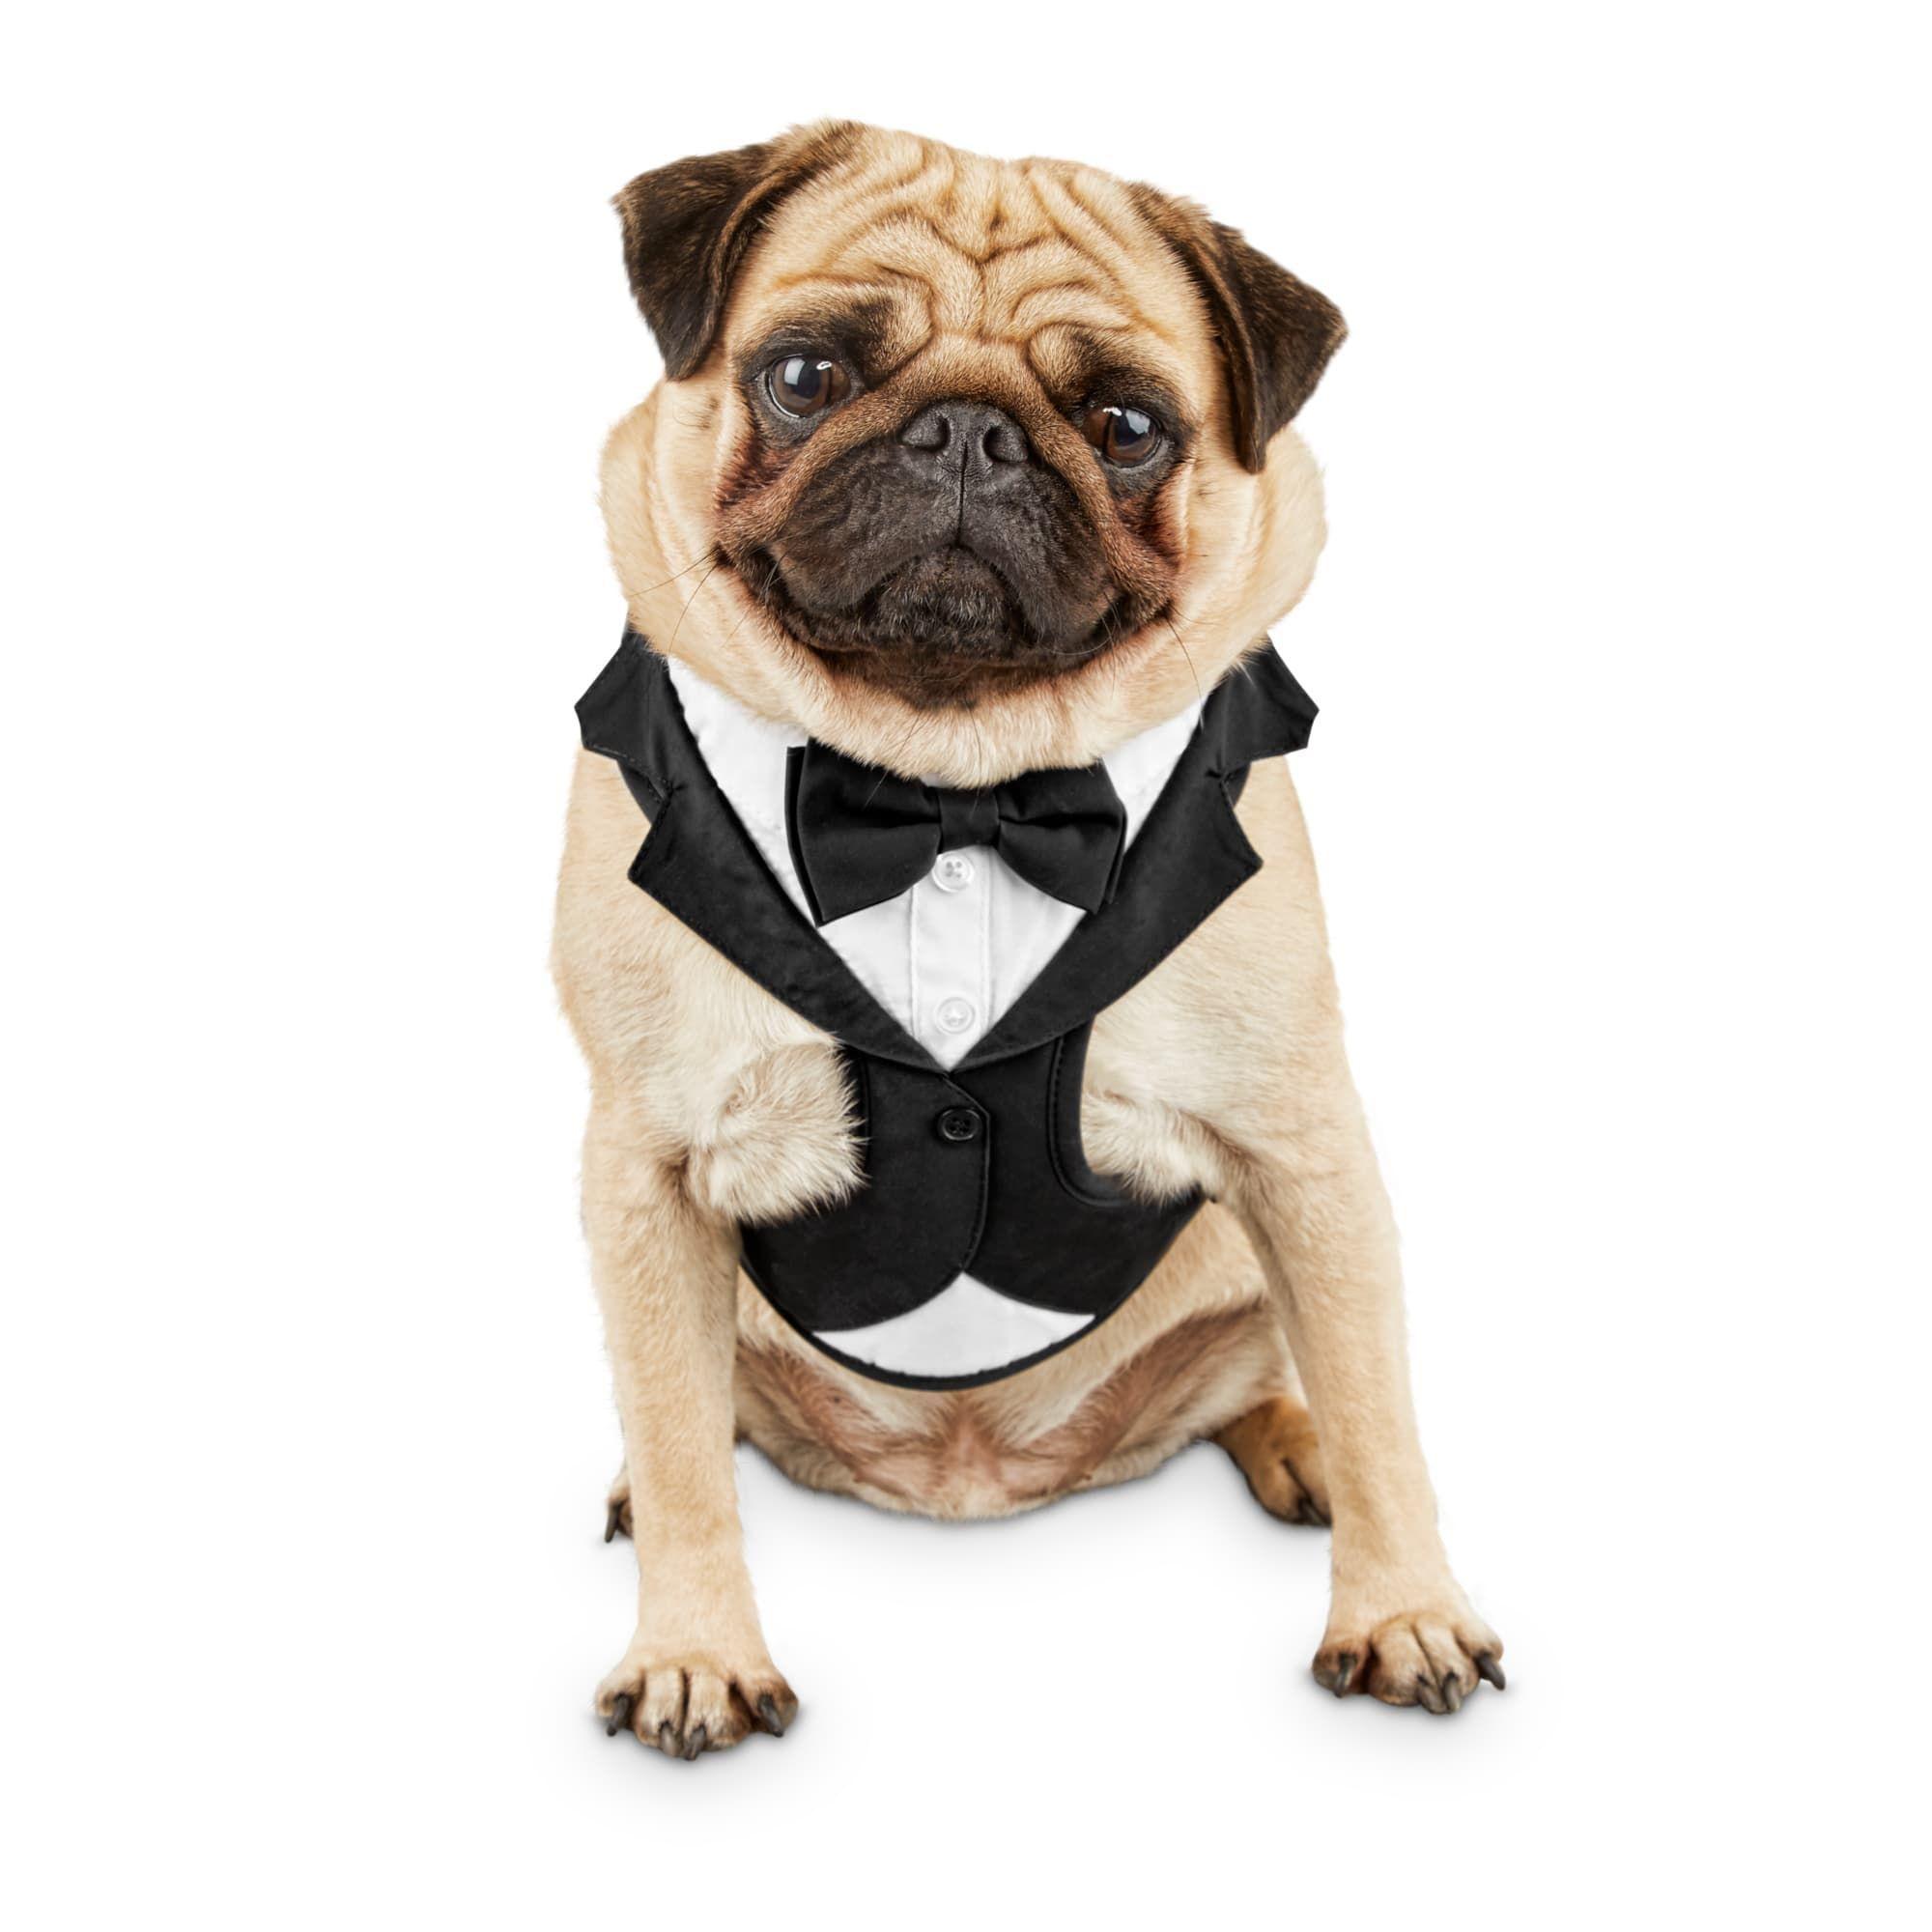 Bond co tuxedo dog harness small petco dog harness